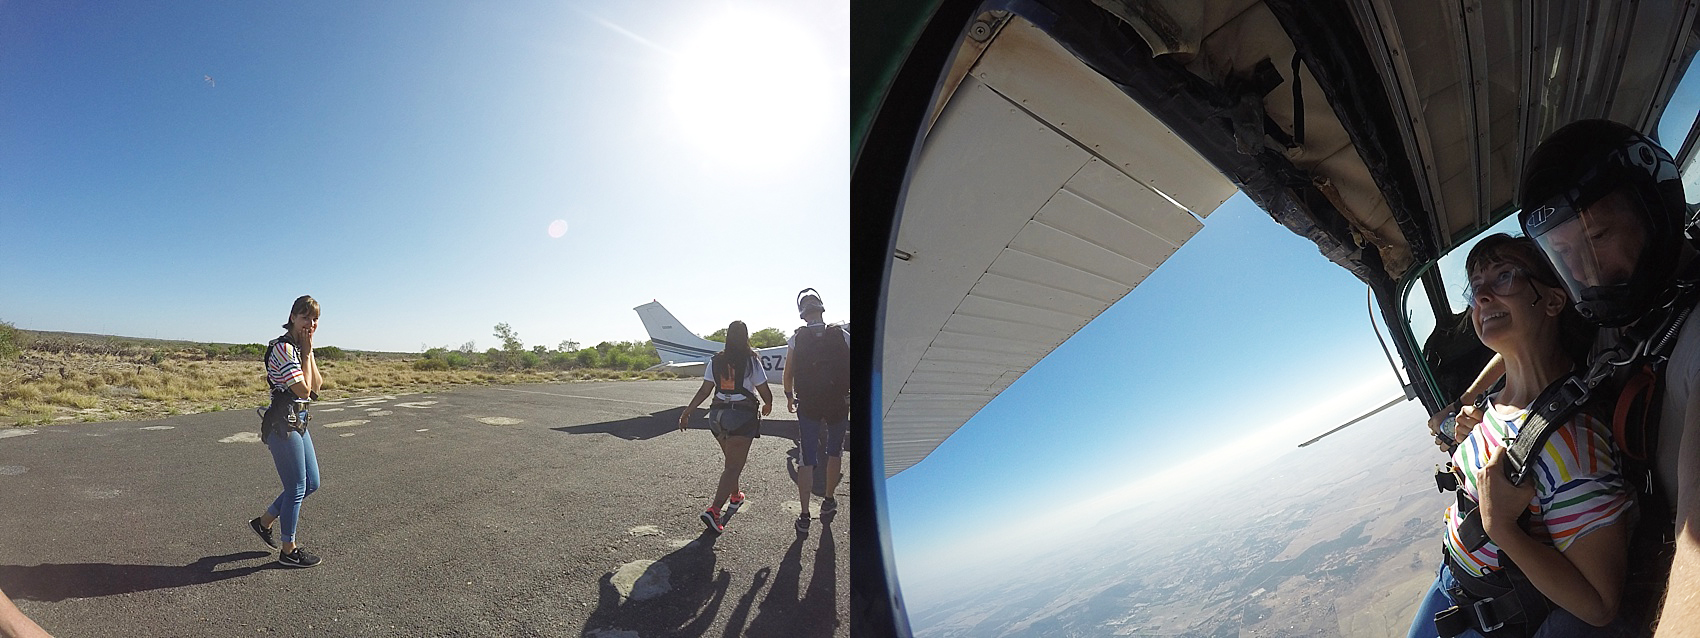 115_SABlog_Skydive.jpg